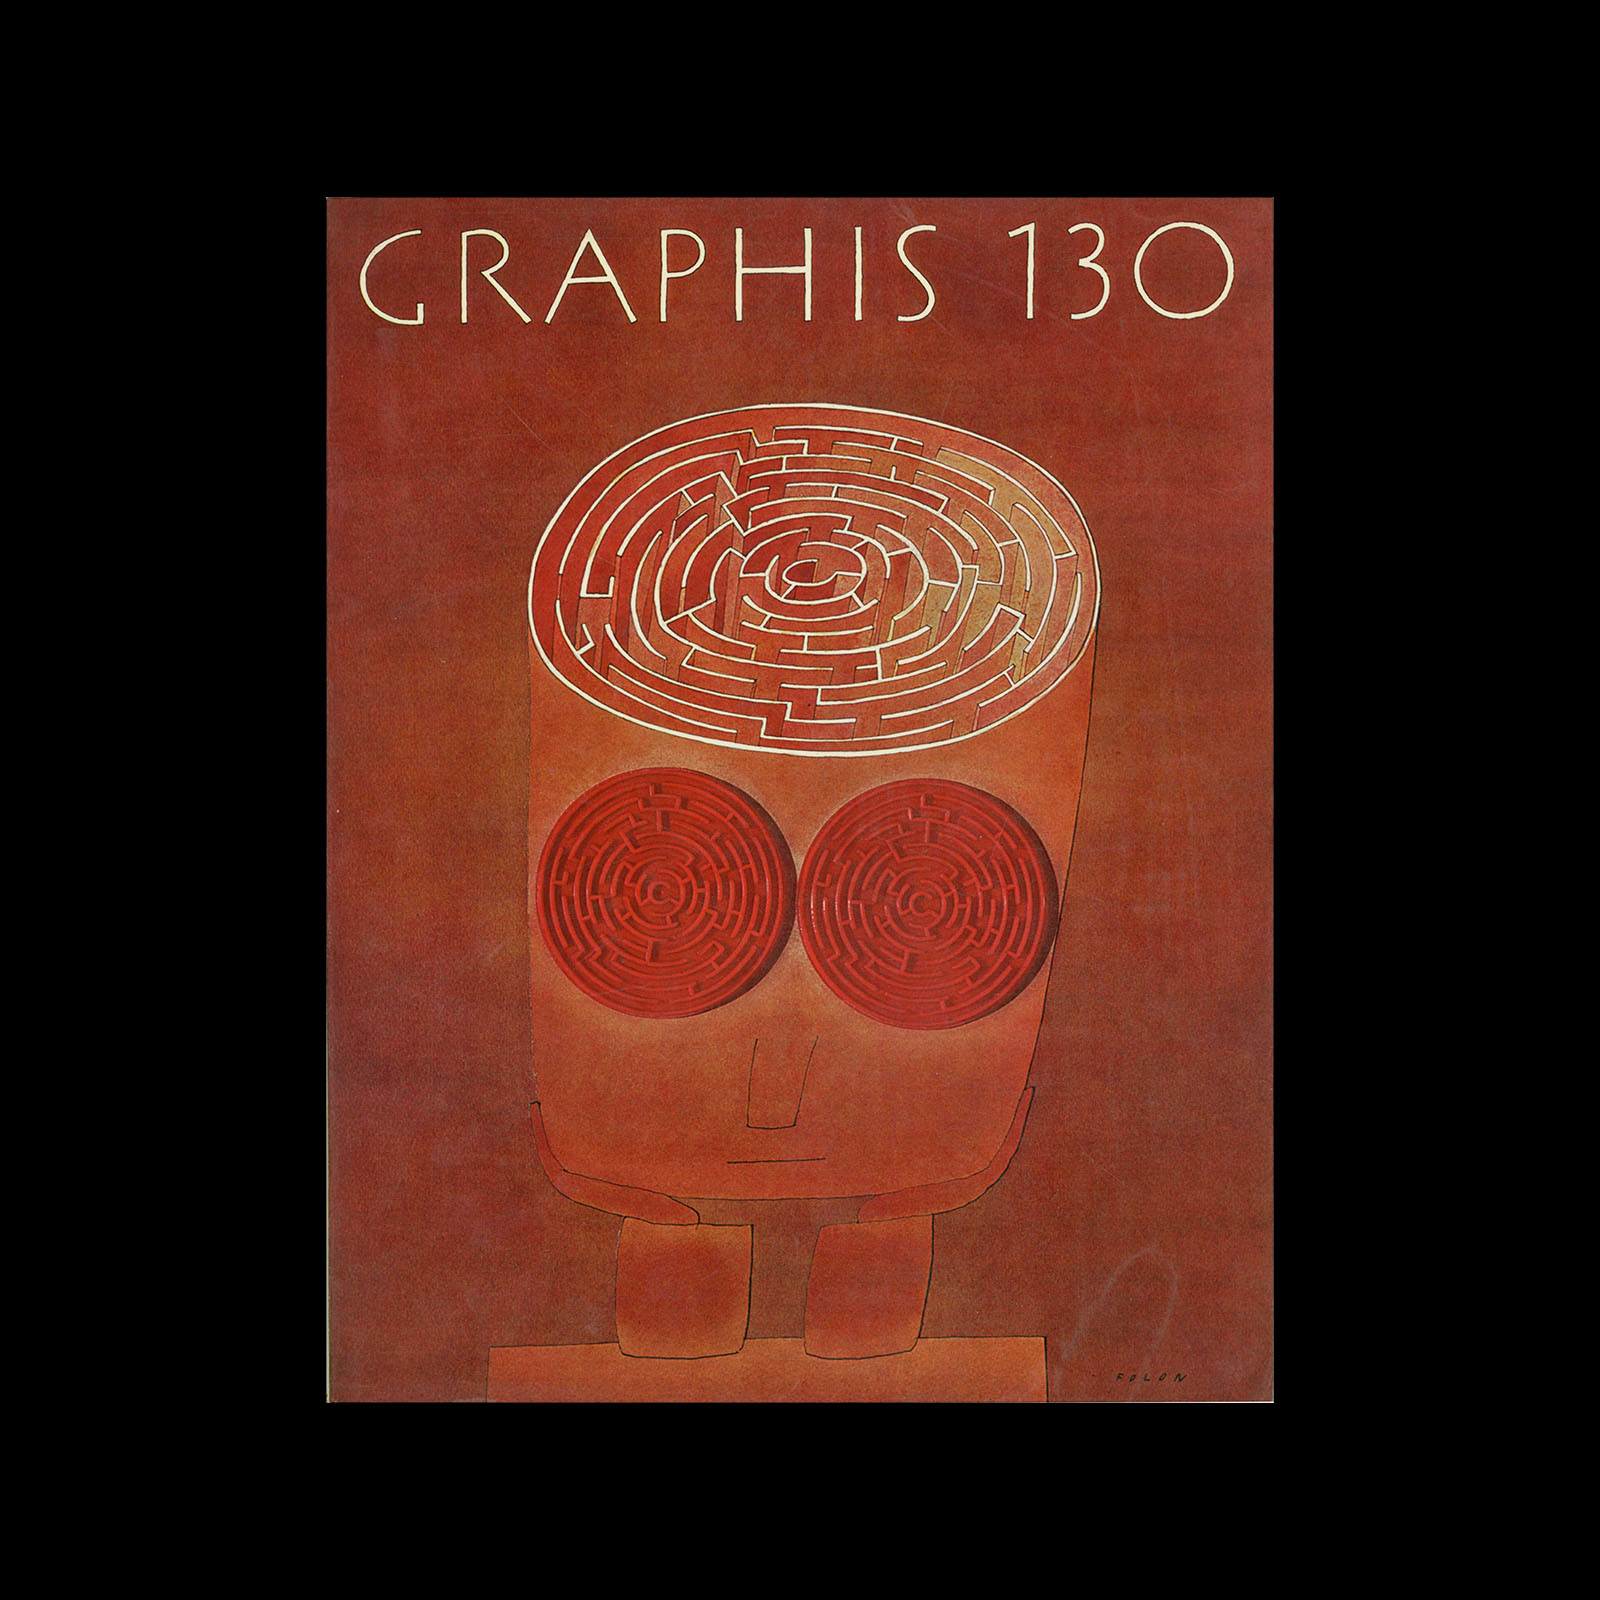 Graphis 130, 1967. Cover design by Jean Michel Folon.